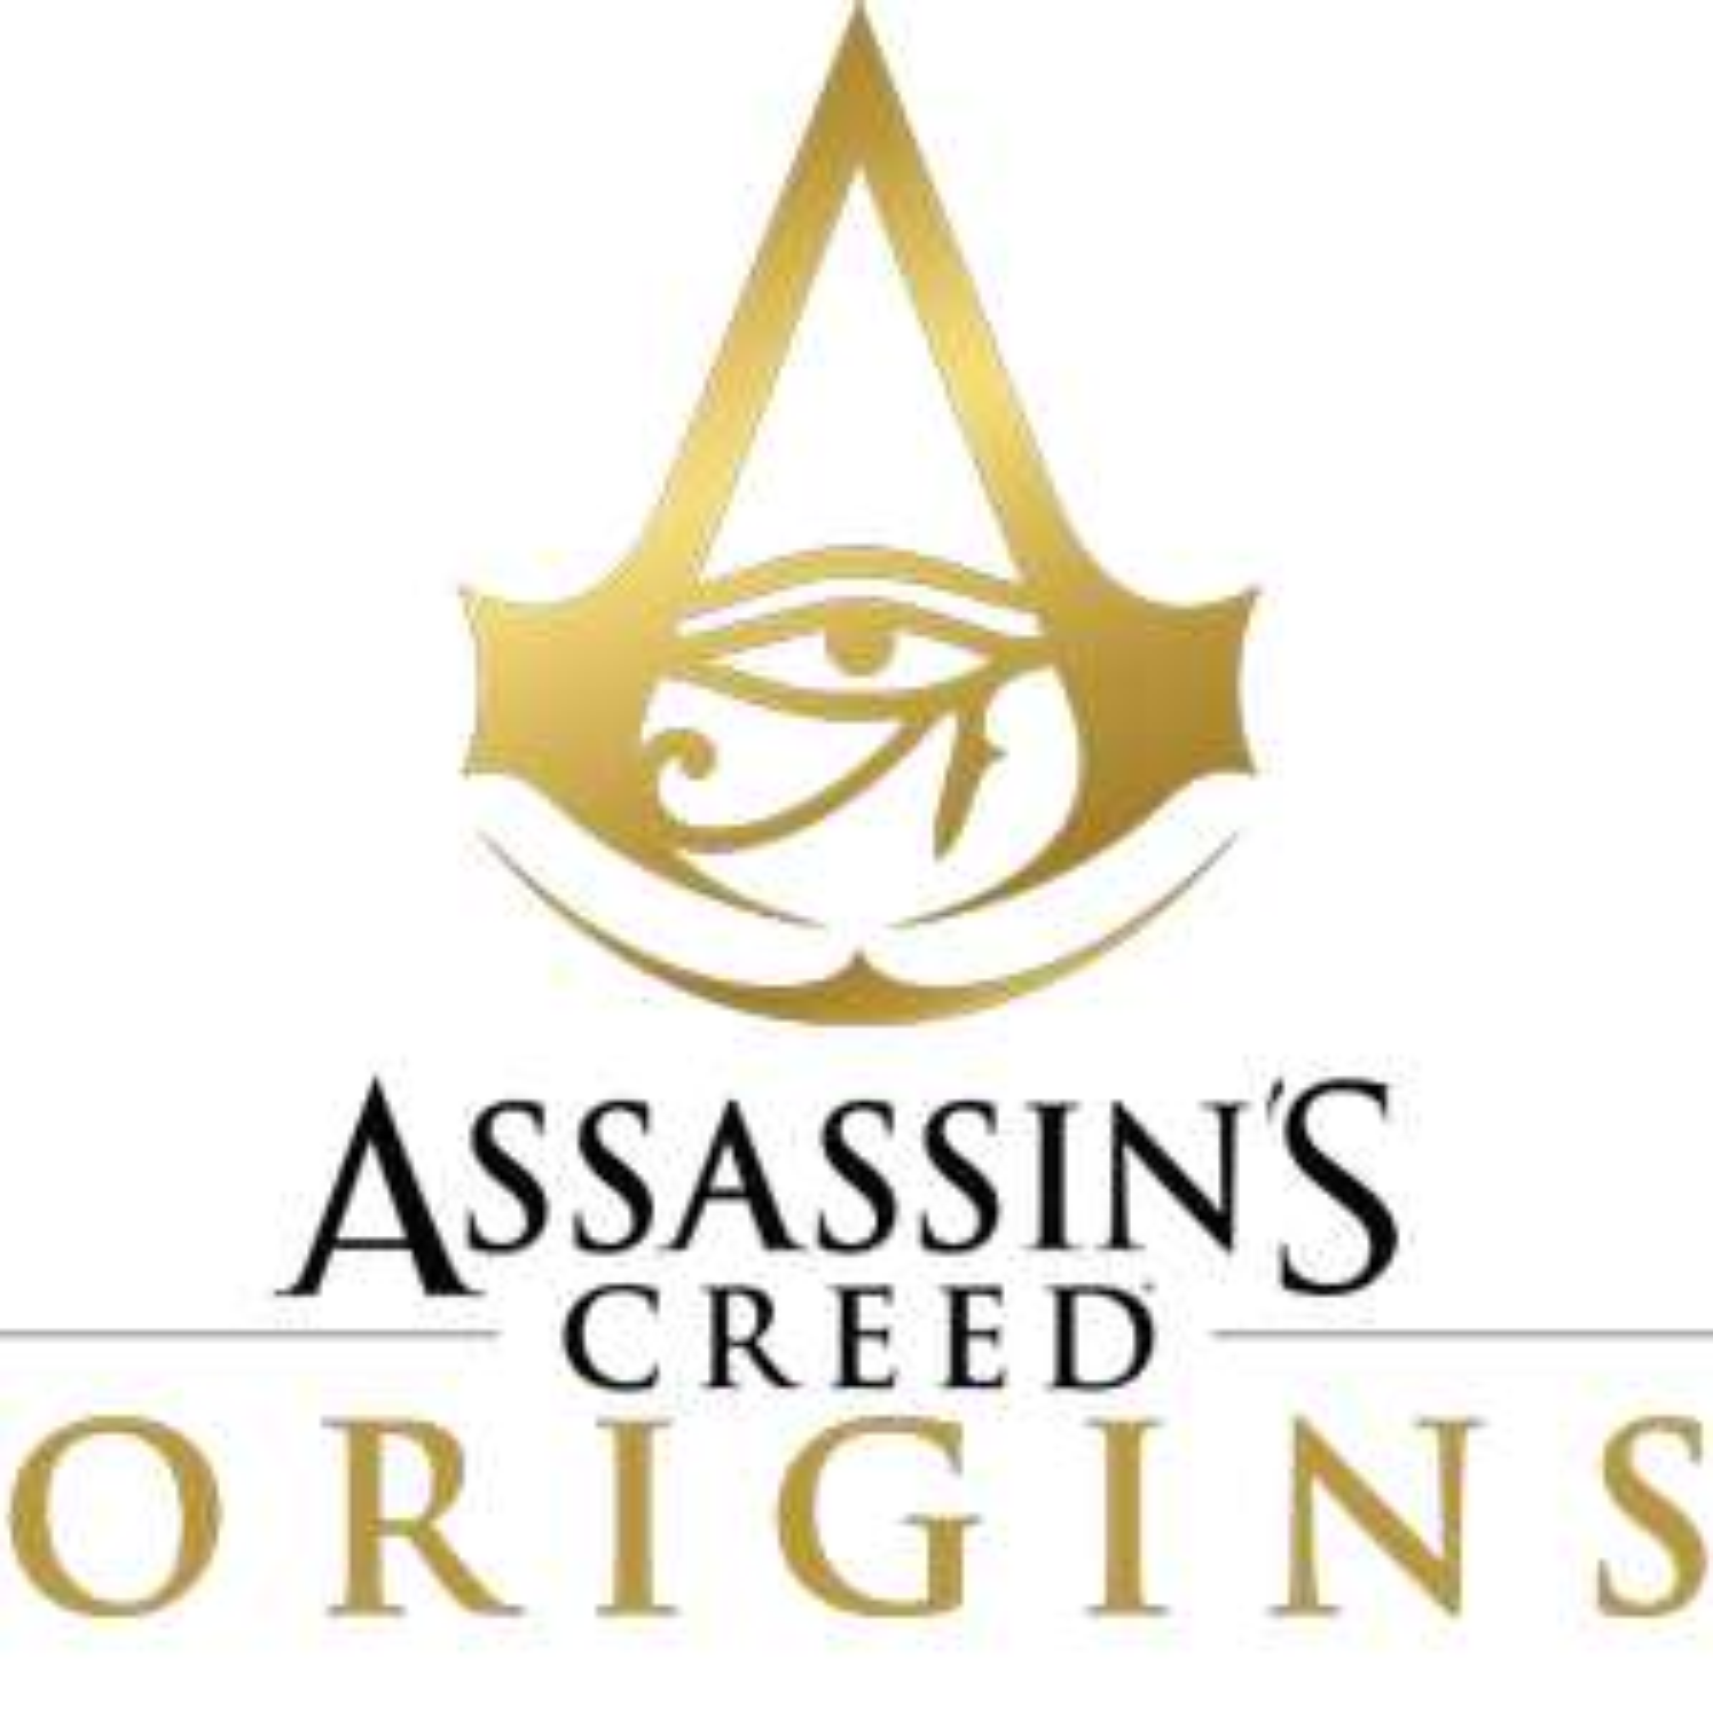 Assassin's Creed Origins (PC) dit weekend gratis speelbaar van 19 - 21 juni @ Uplay